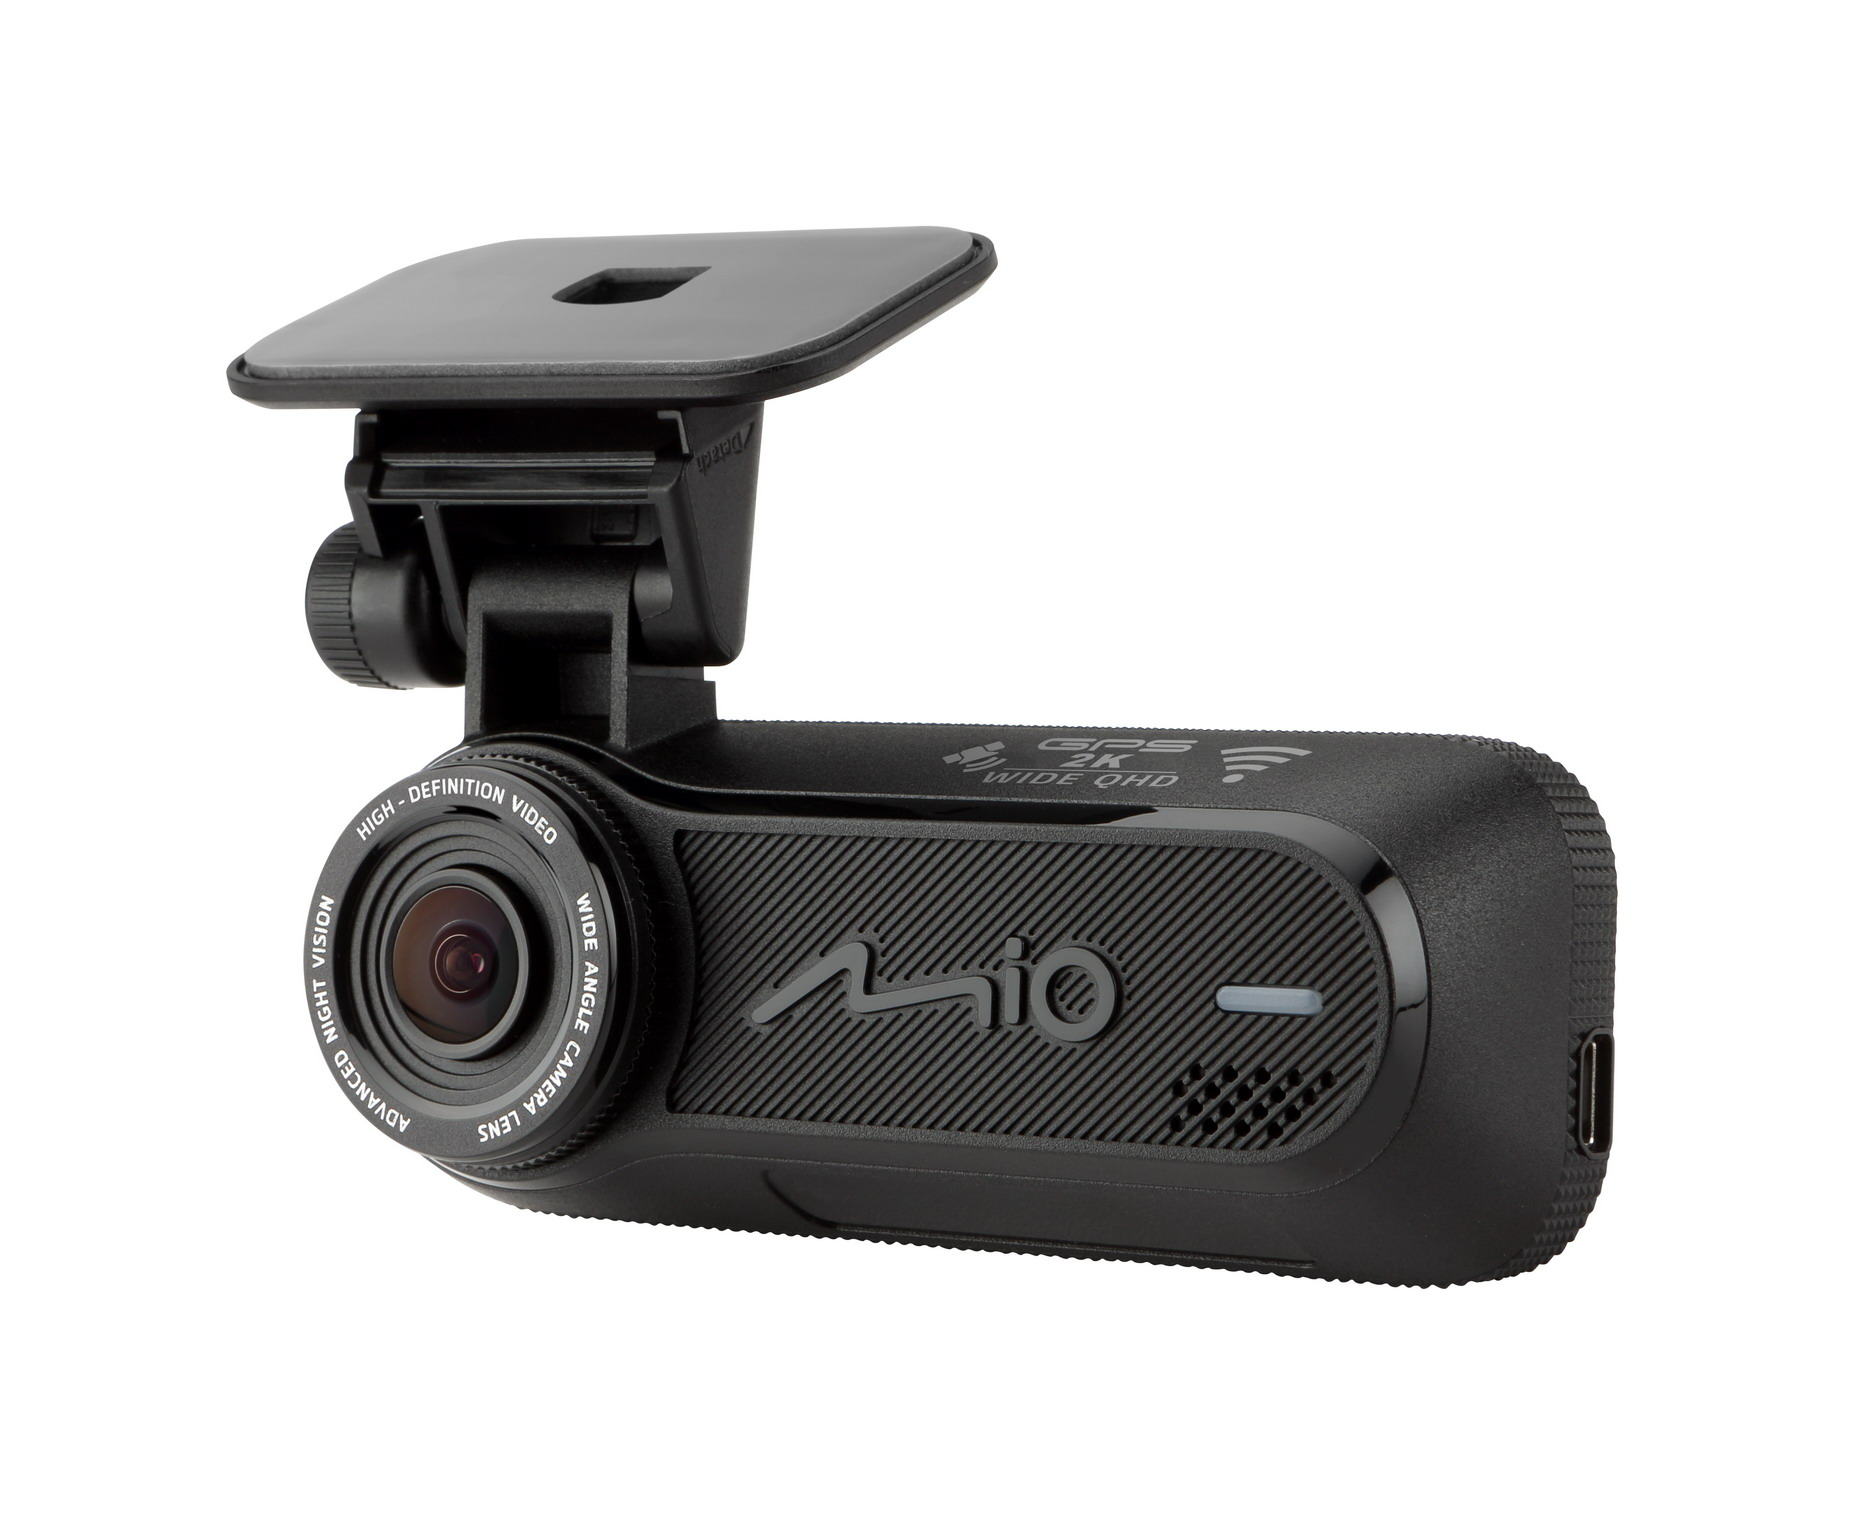 Kamera do auta Mio MiVue J85 WIFI 2.5K QHD